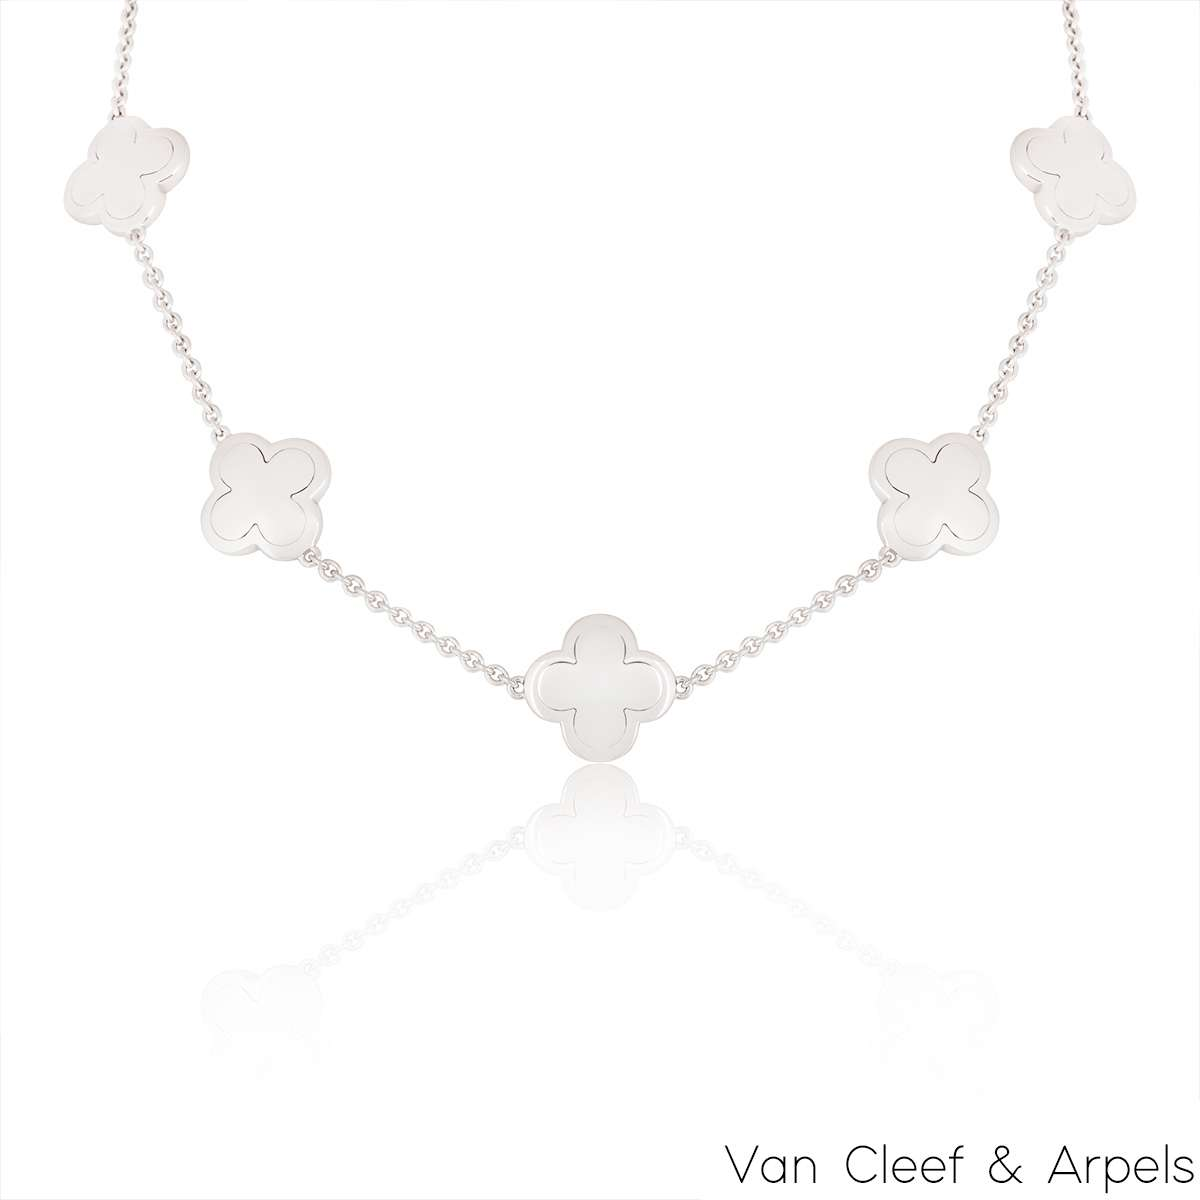 Van Cleef & Arpels White Gold Alhambra Necklace